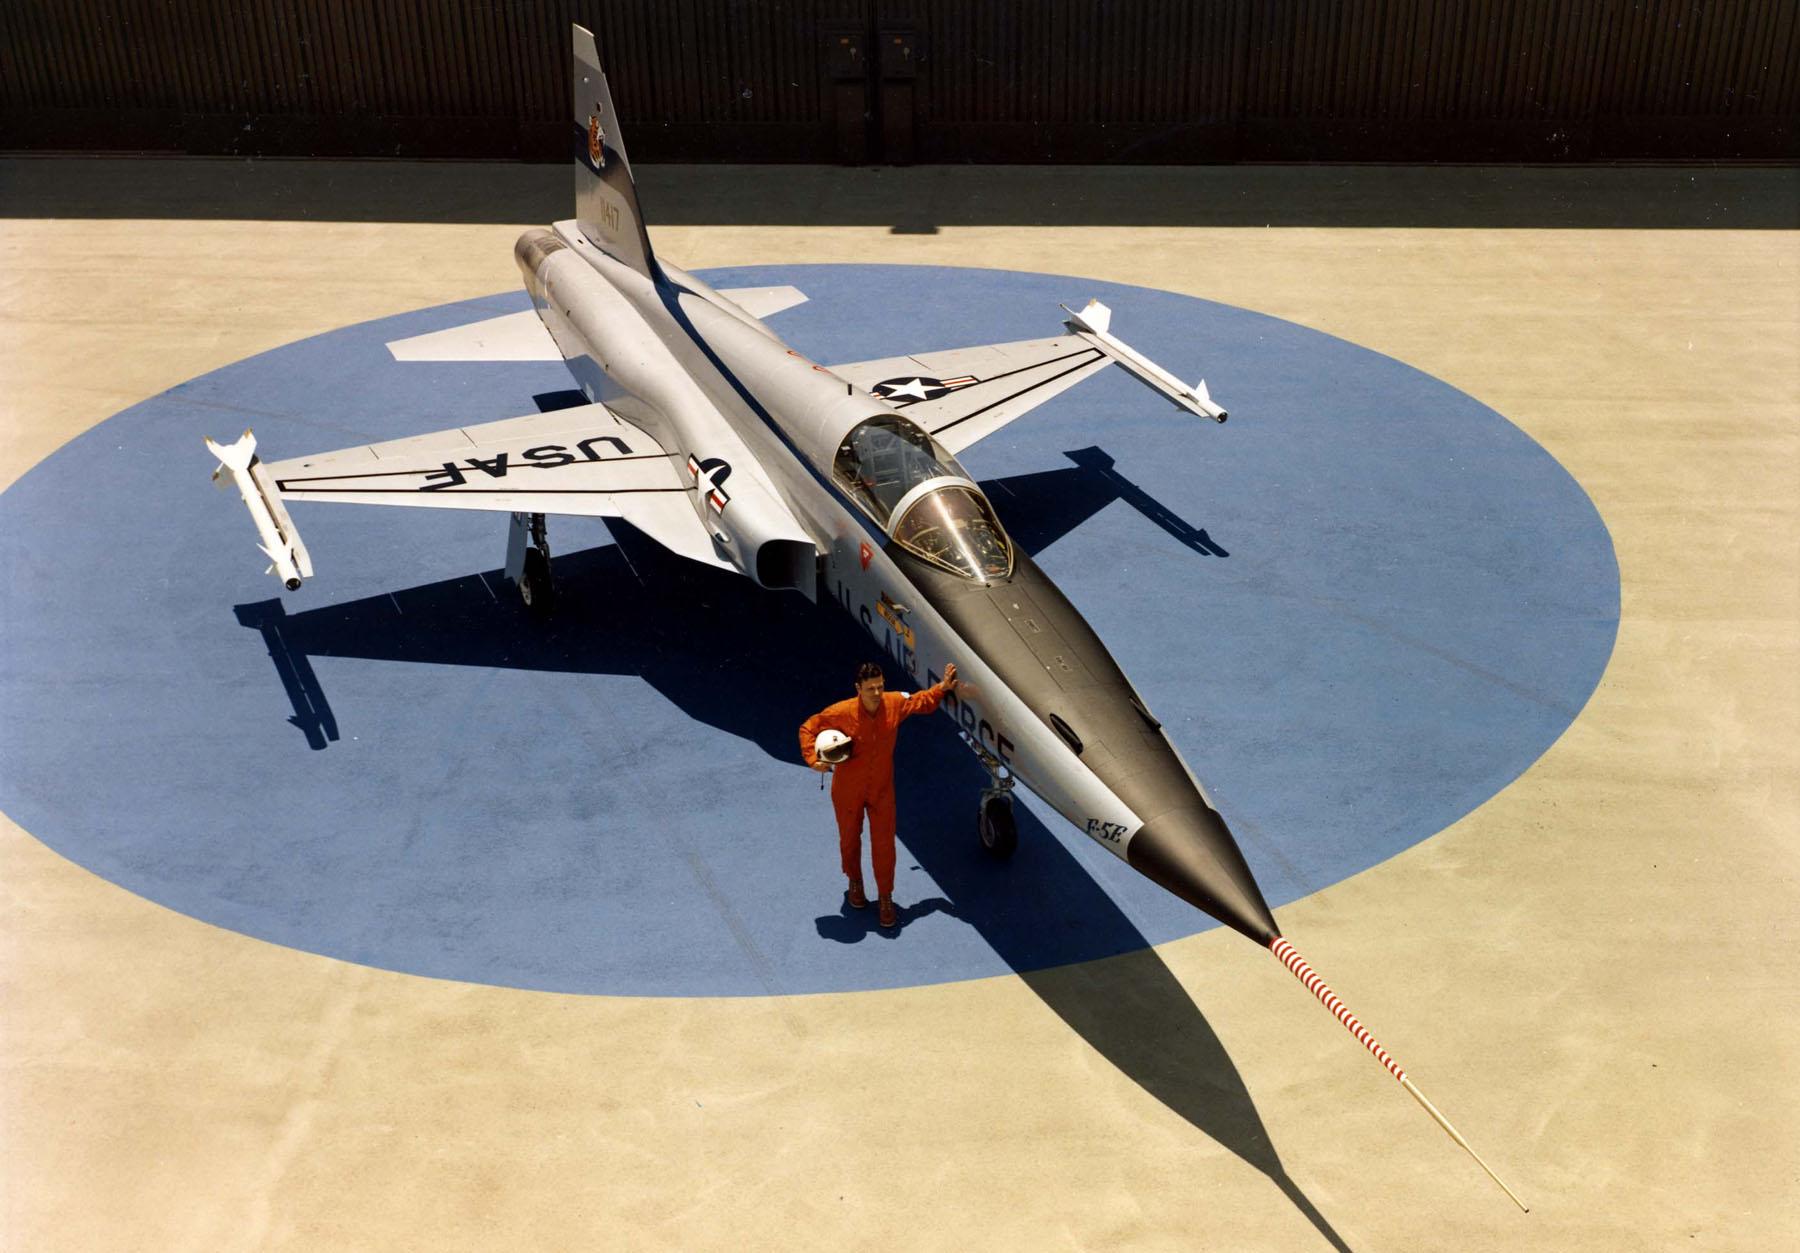 https://upload.wikimedia.org/wikipedia/commons/5/5f/Northrop_F-5E_(Tail_No._11417)_061006-F-1234S-067.jpg